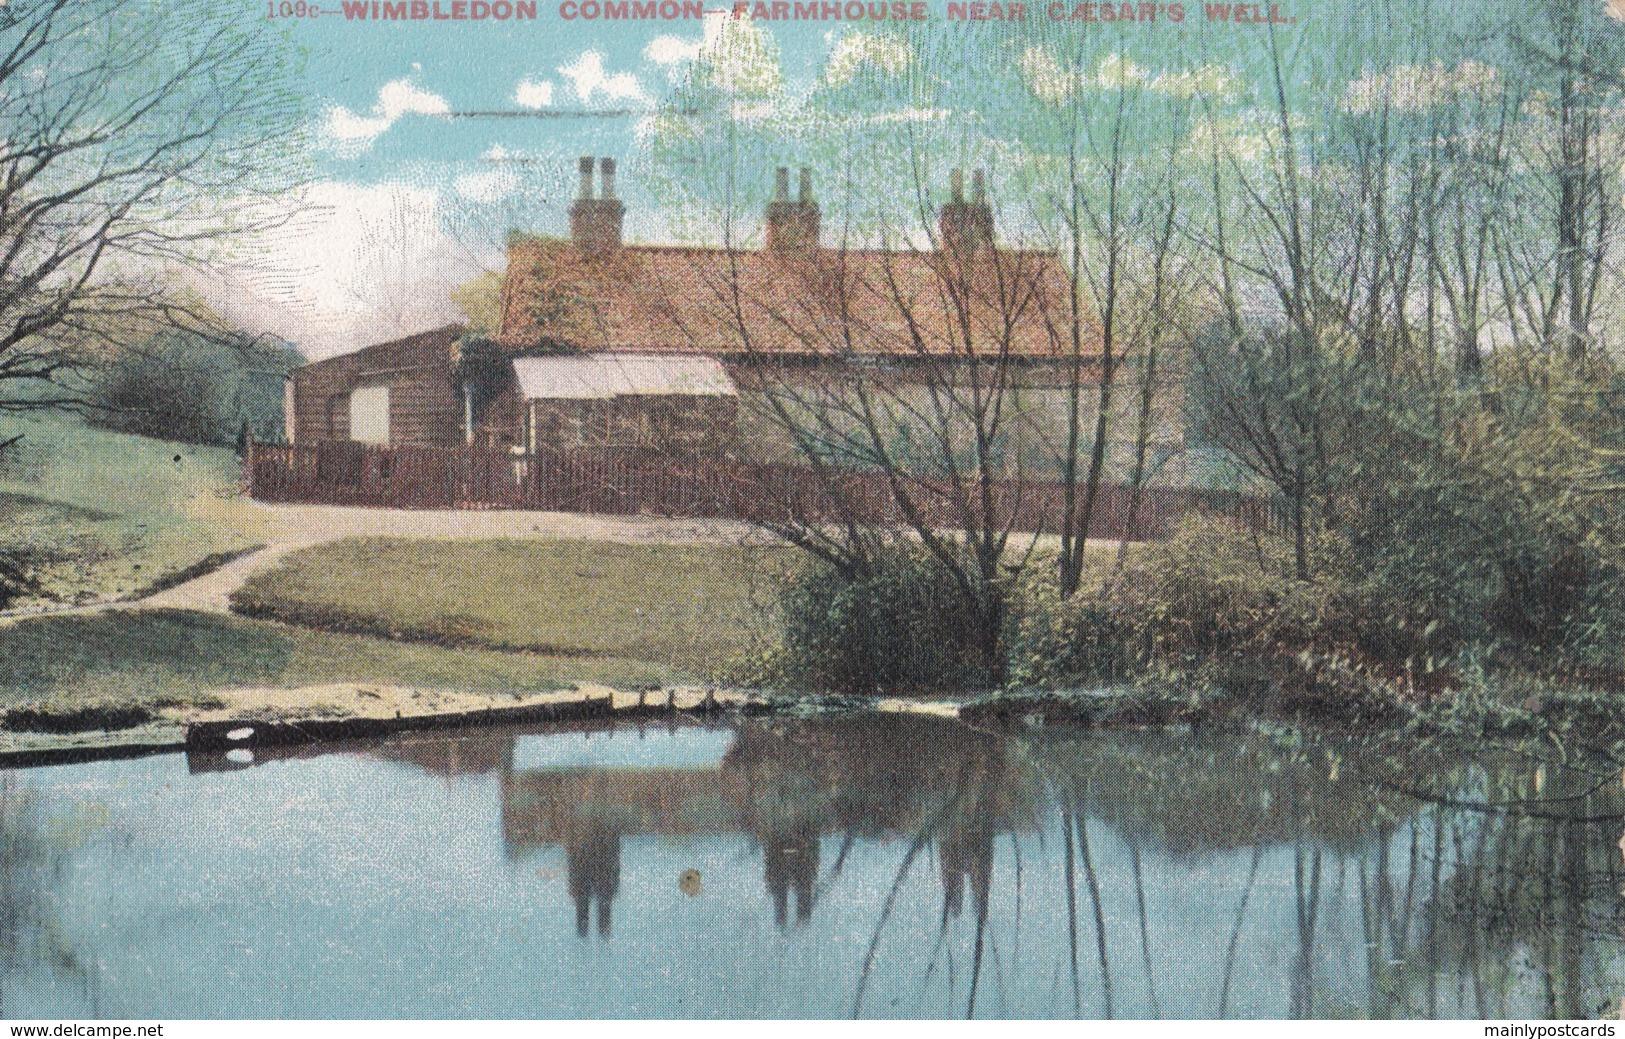 AQ05 Wimbledon Common, Farmhouse Near Caesar's Well - London Suburbs